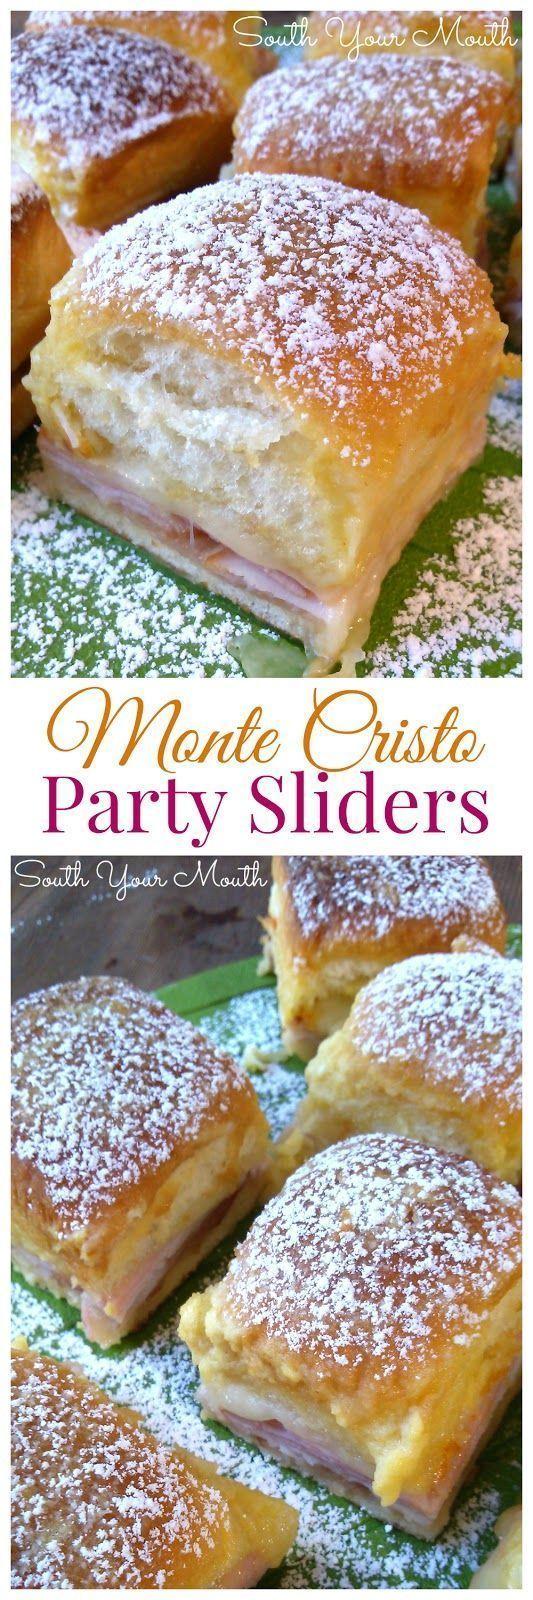 Monte Cristo Party Sliders